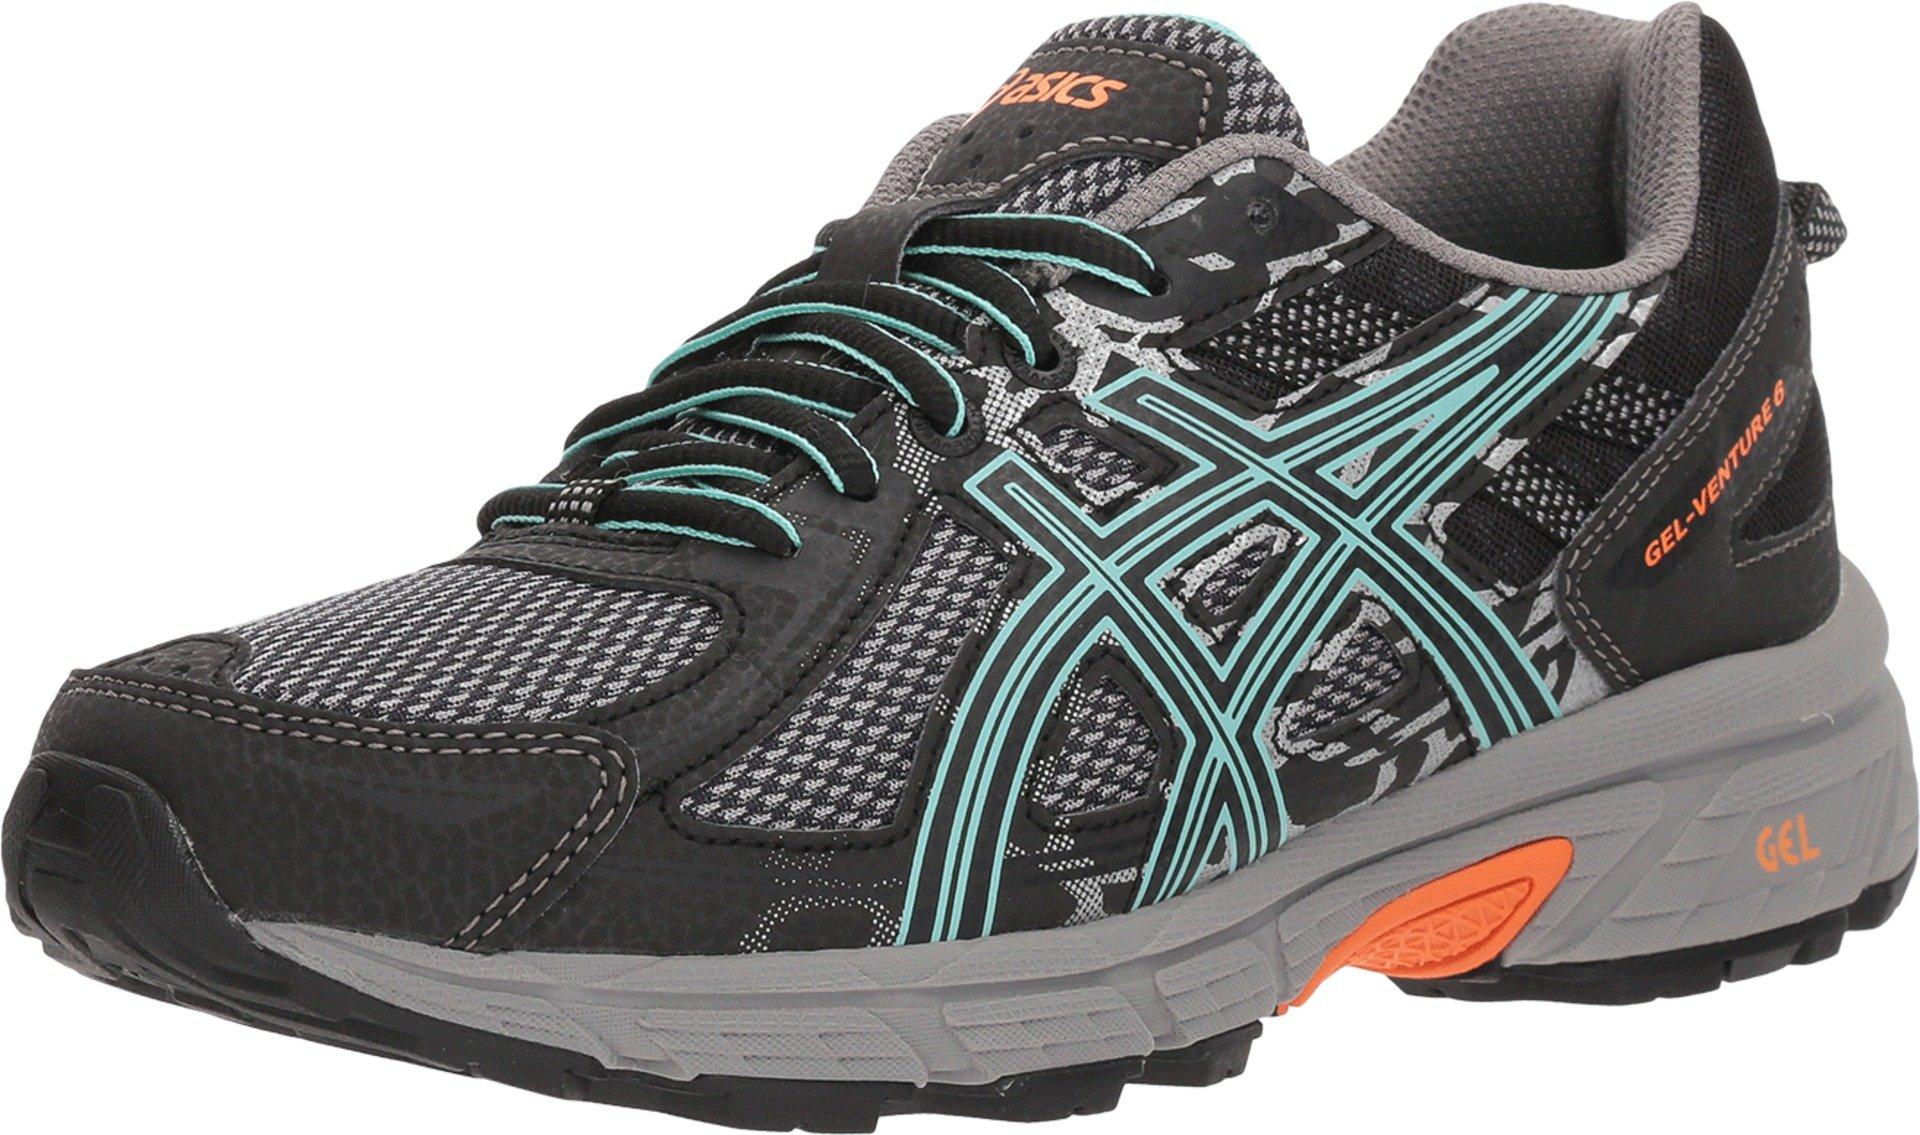 ASICS Womens Gel-Venture 6 Running Shoes Black/Ice Green/Orange 5 B(M) US